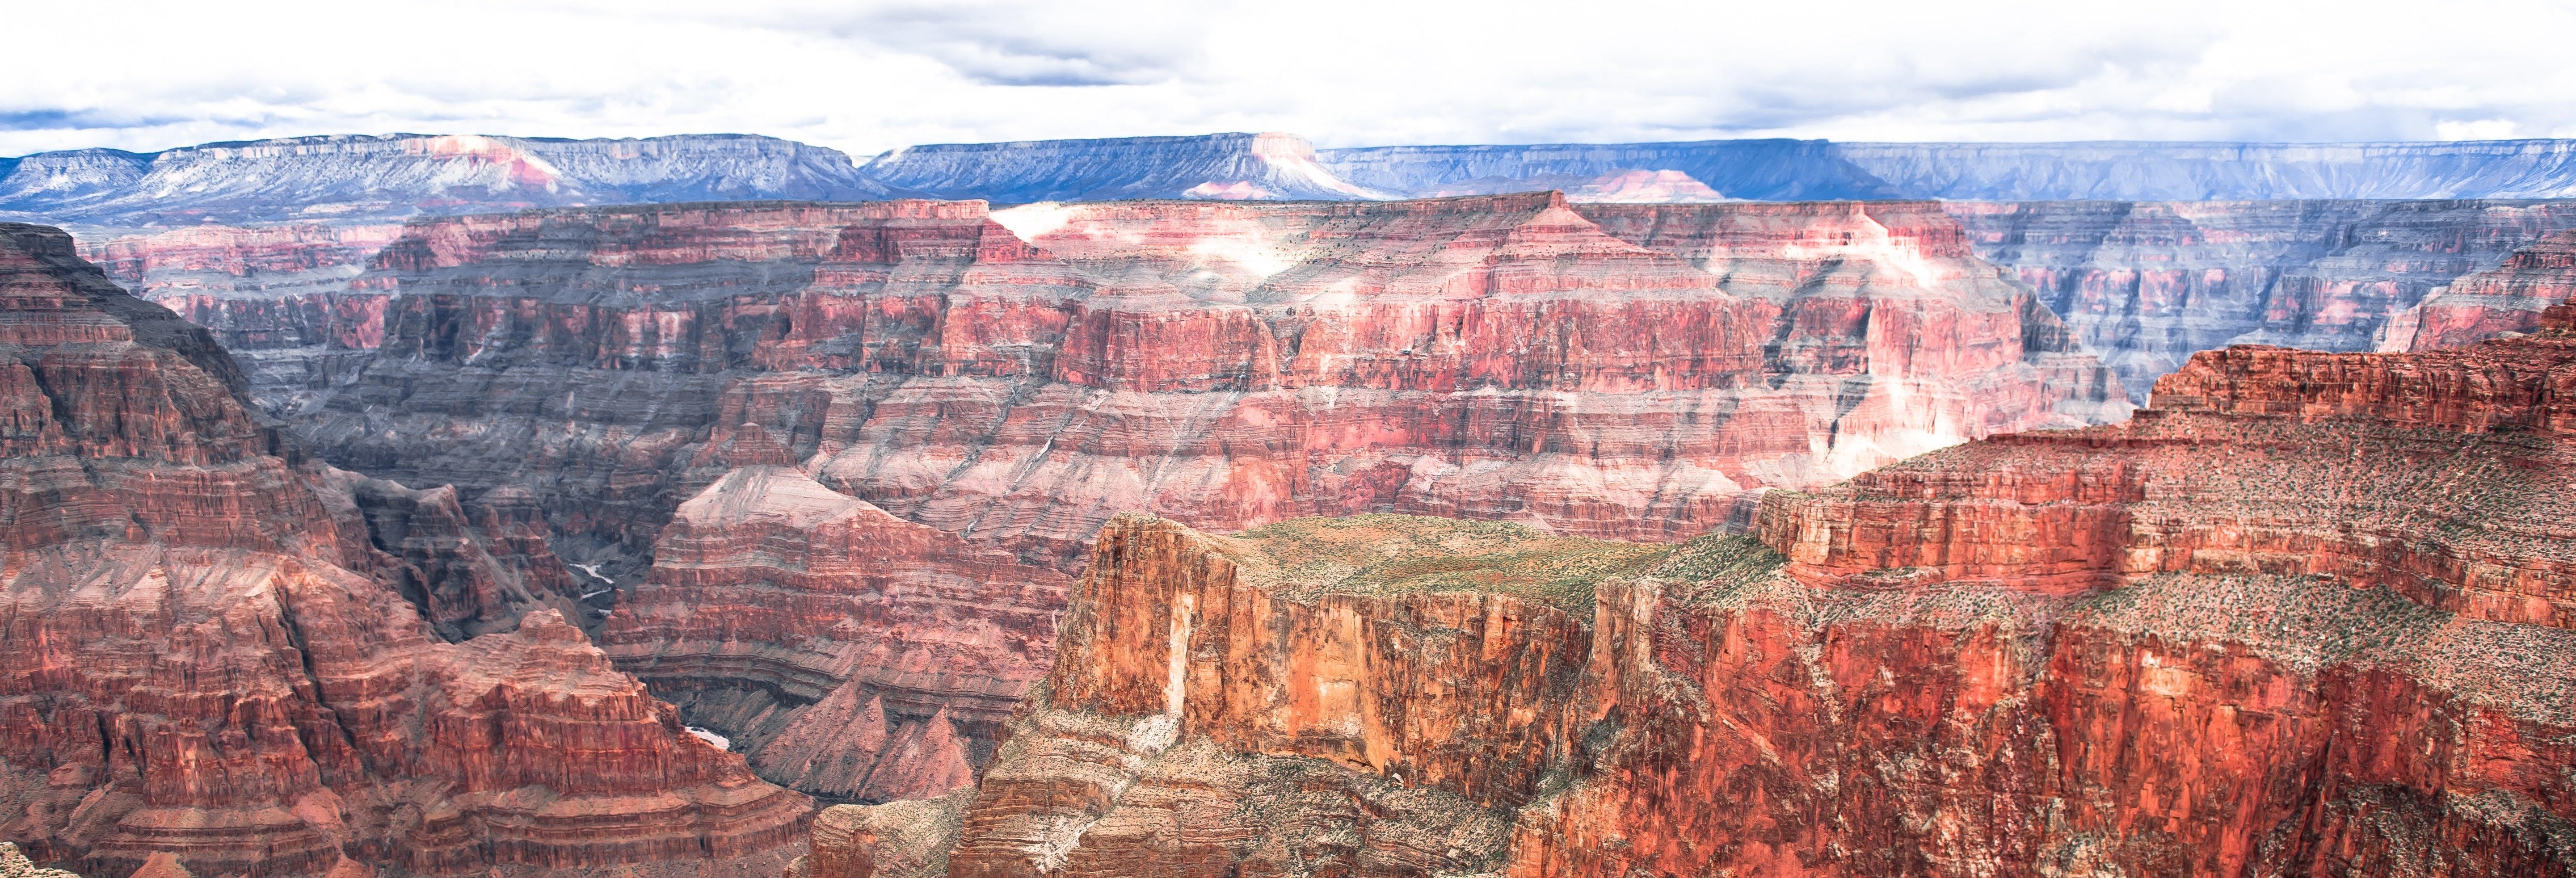 Excursion au Grand Canyon + Parc national Joshua Tree